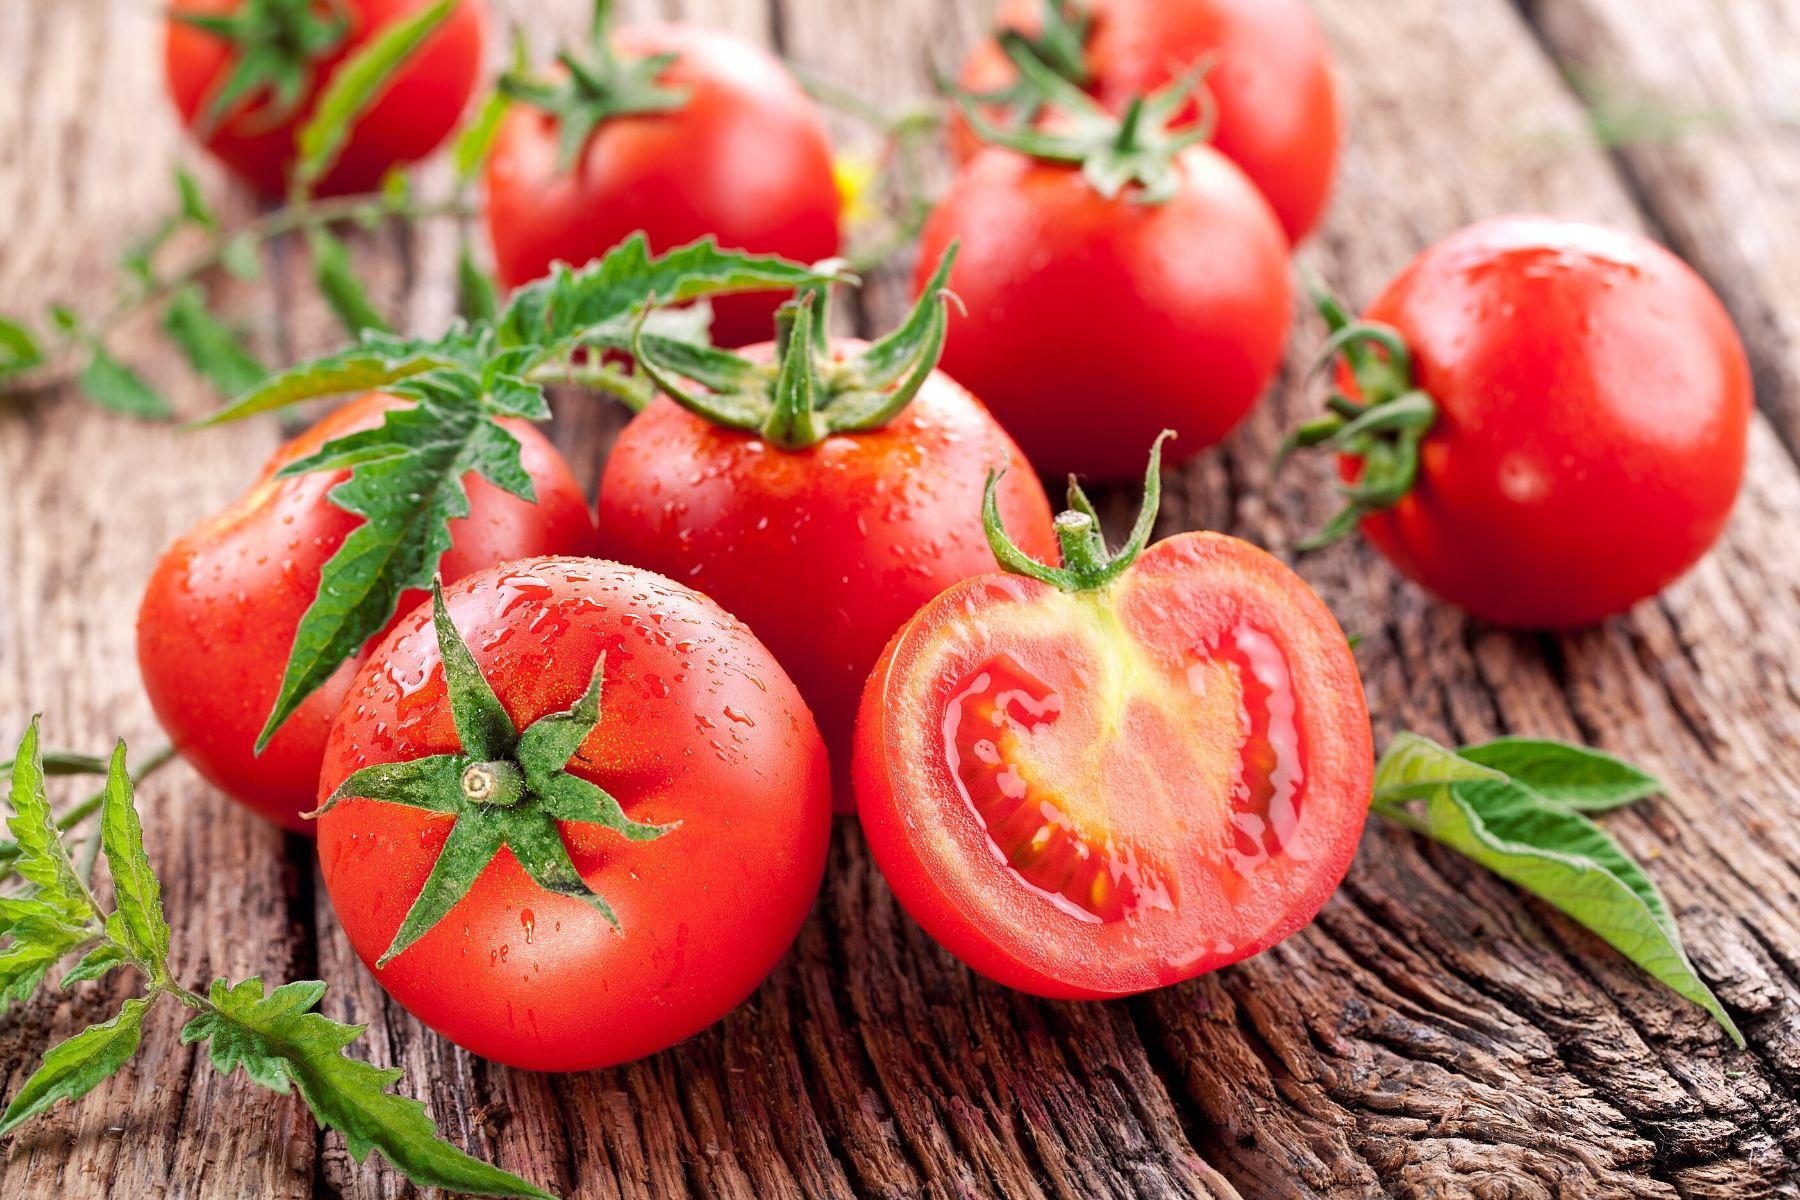 HappyFresh_How_To_Store_Tomatoes